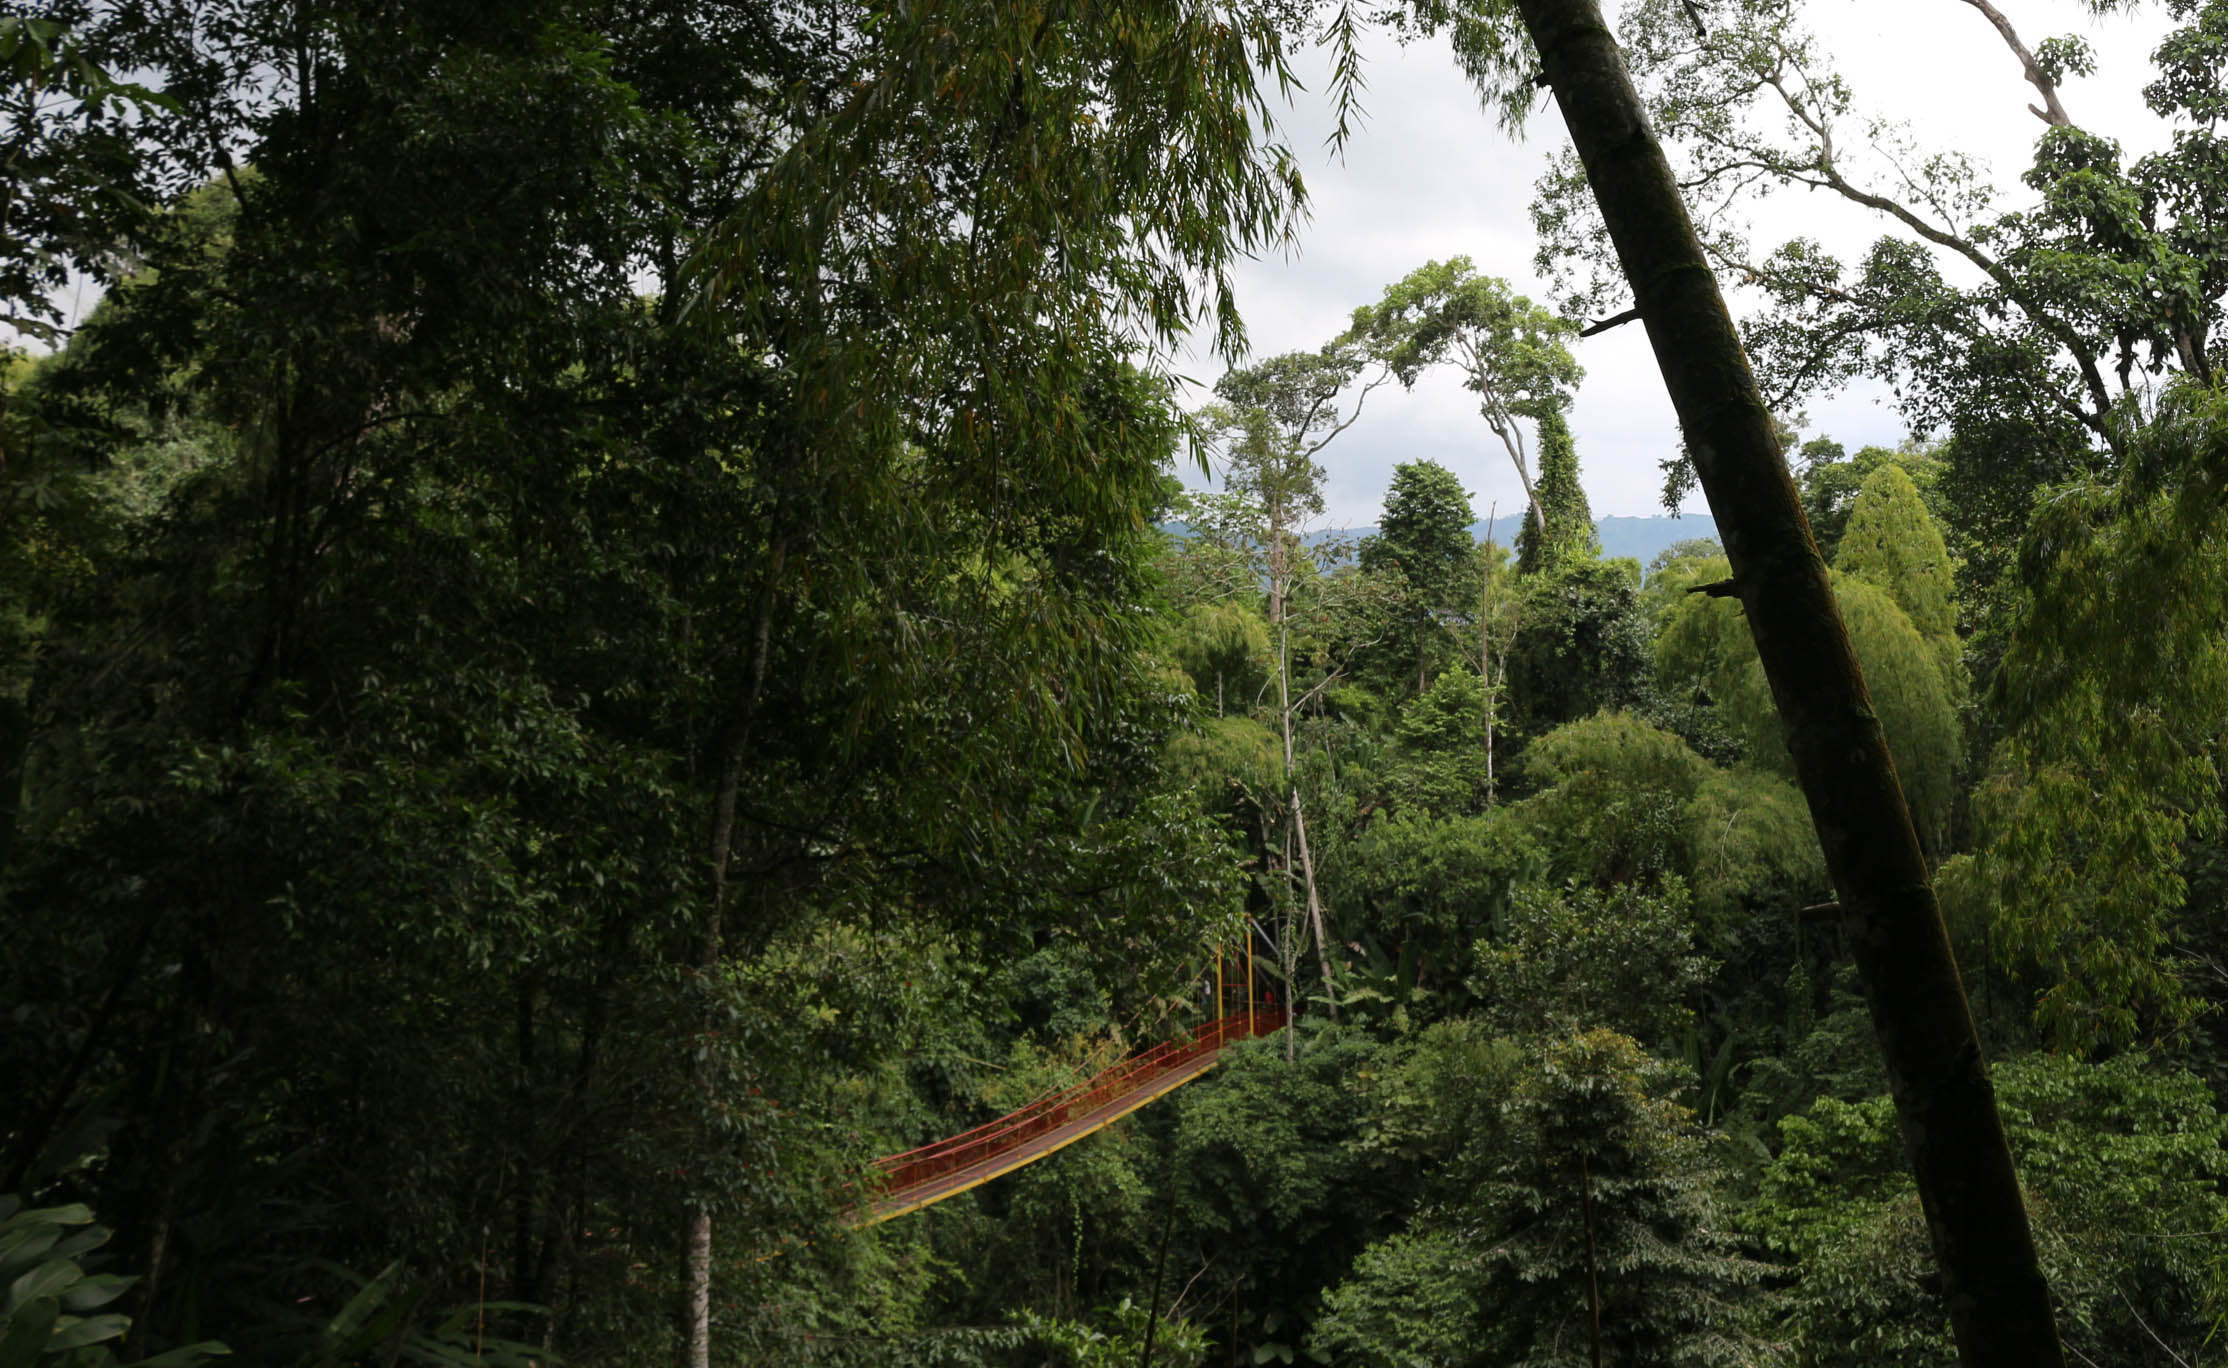 Incroyable nature en Colombie